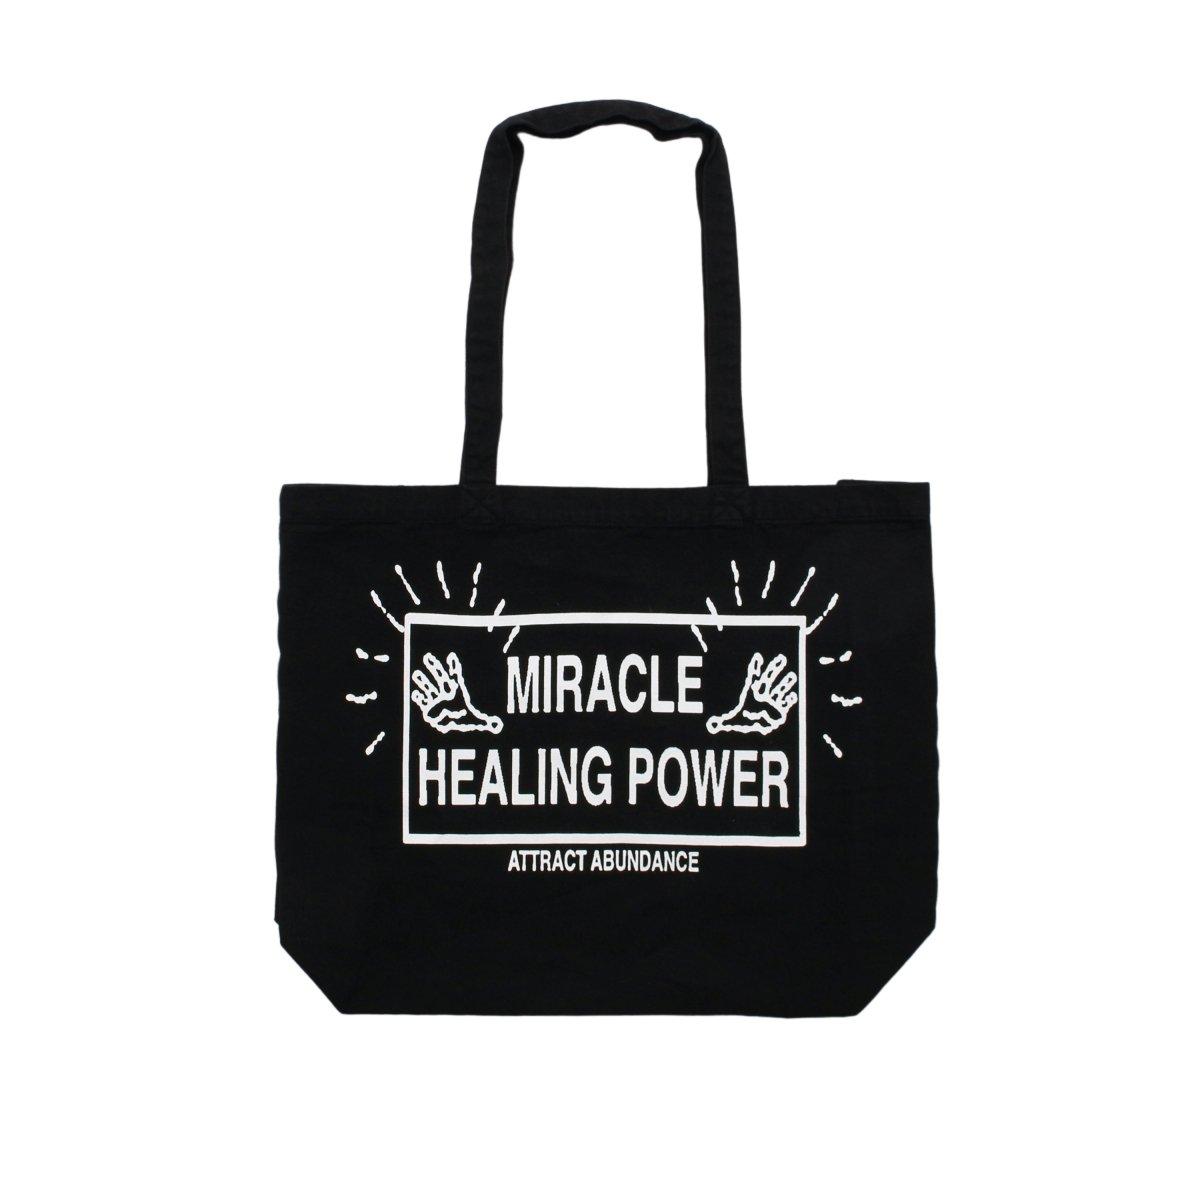 MIRACLE HEALING POWER CANVAS TOTEBAG